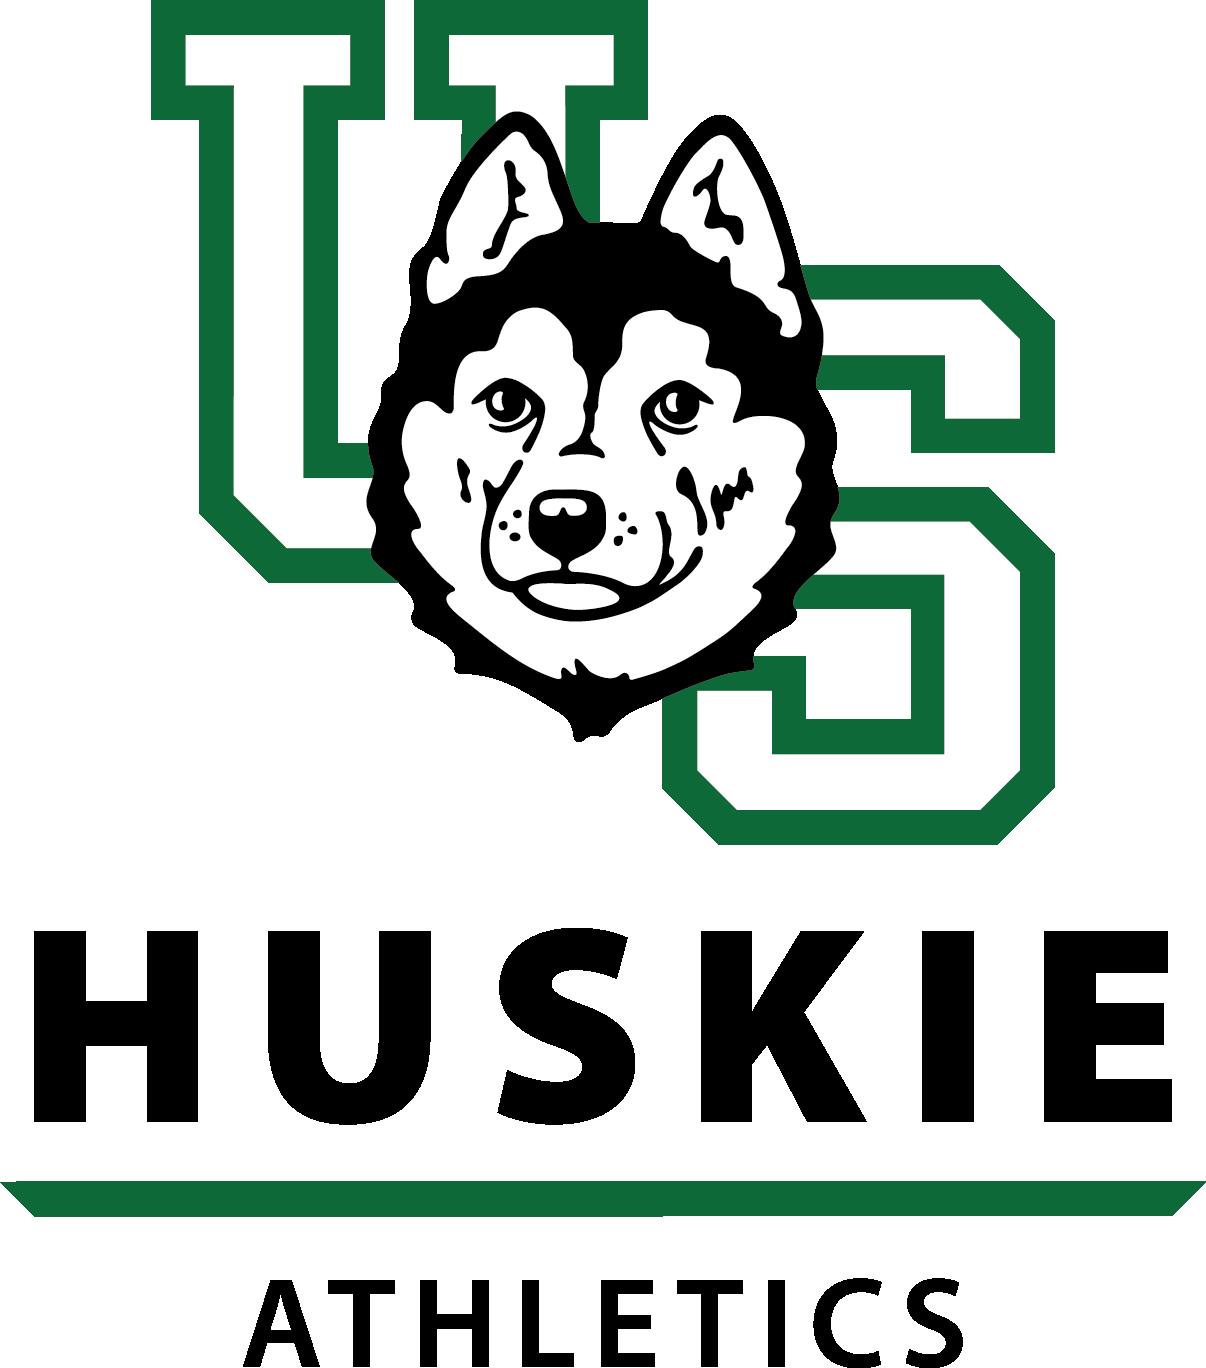 Huskies_Lockup_Primary_Athletics_clr.png (69 KB)